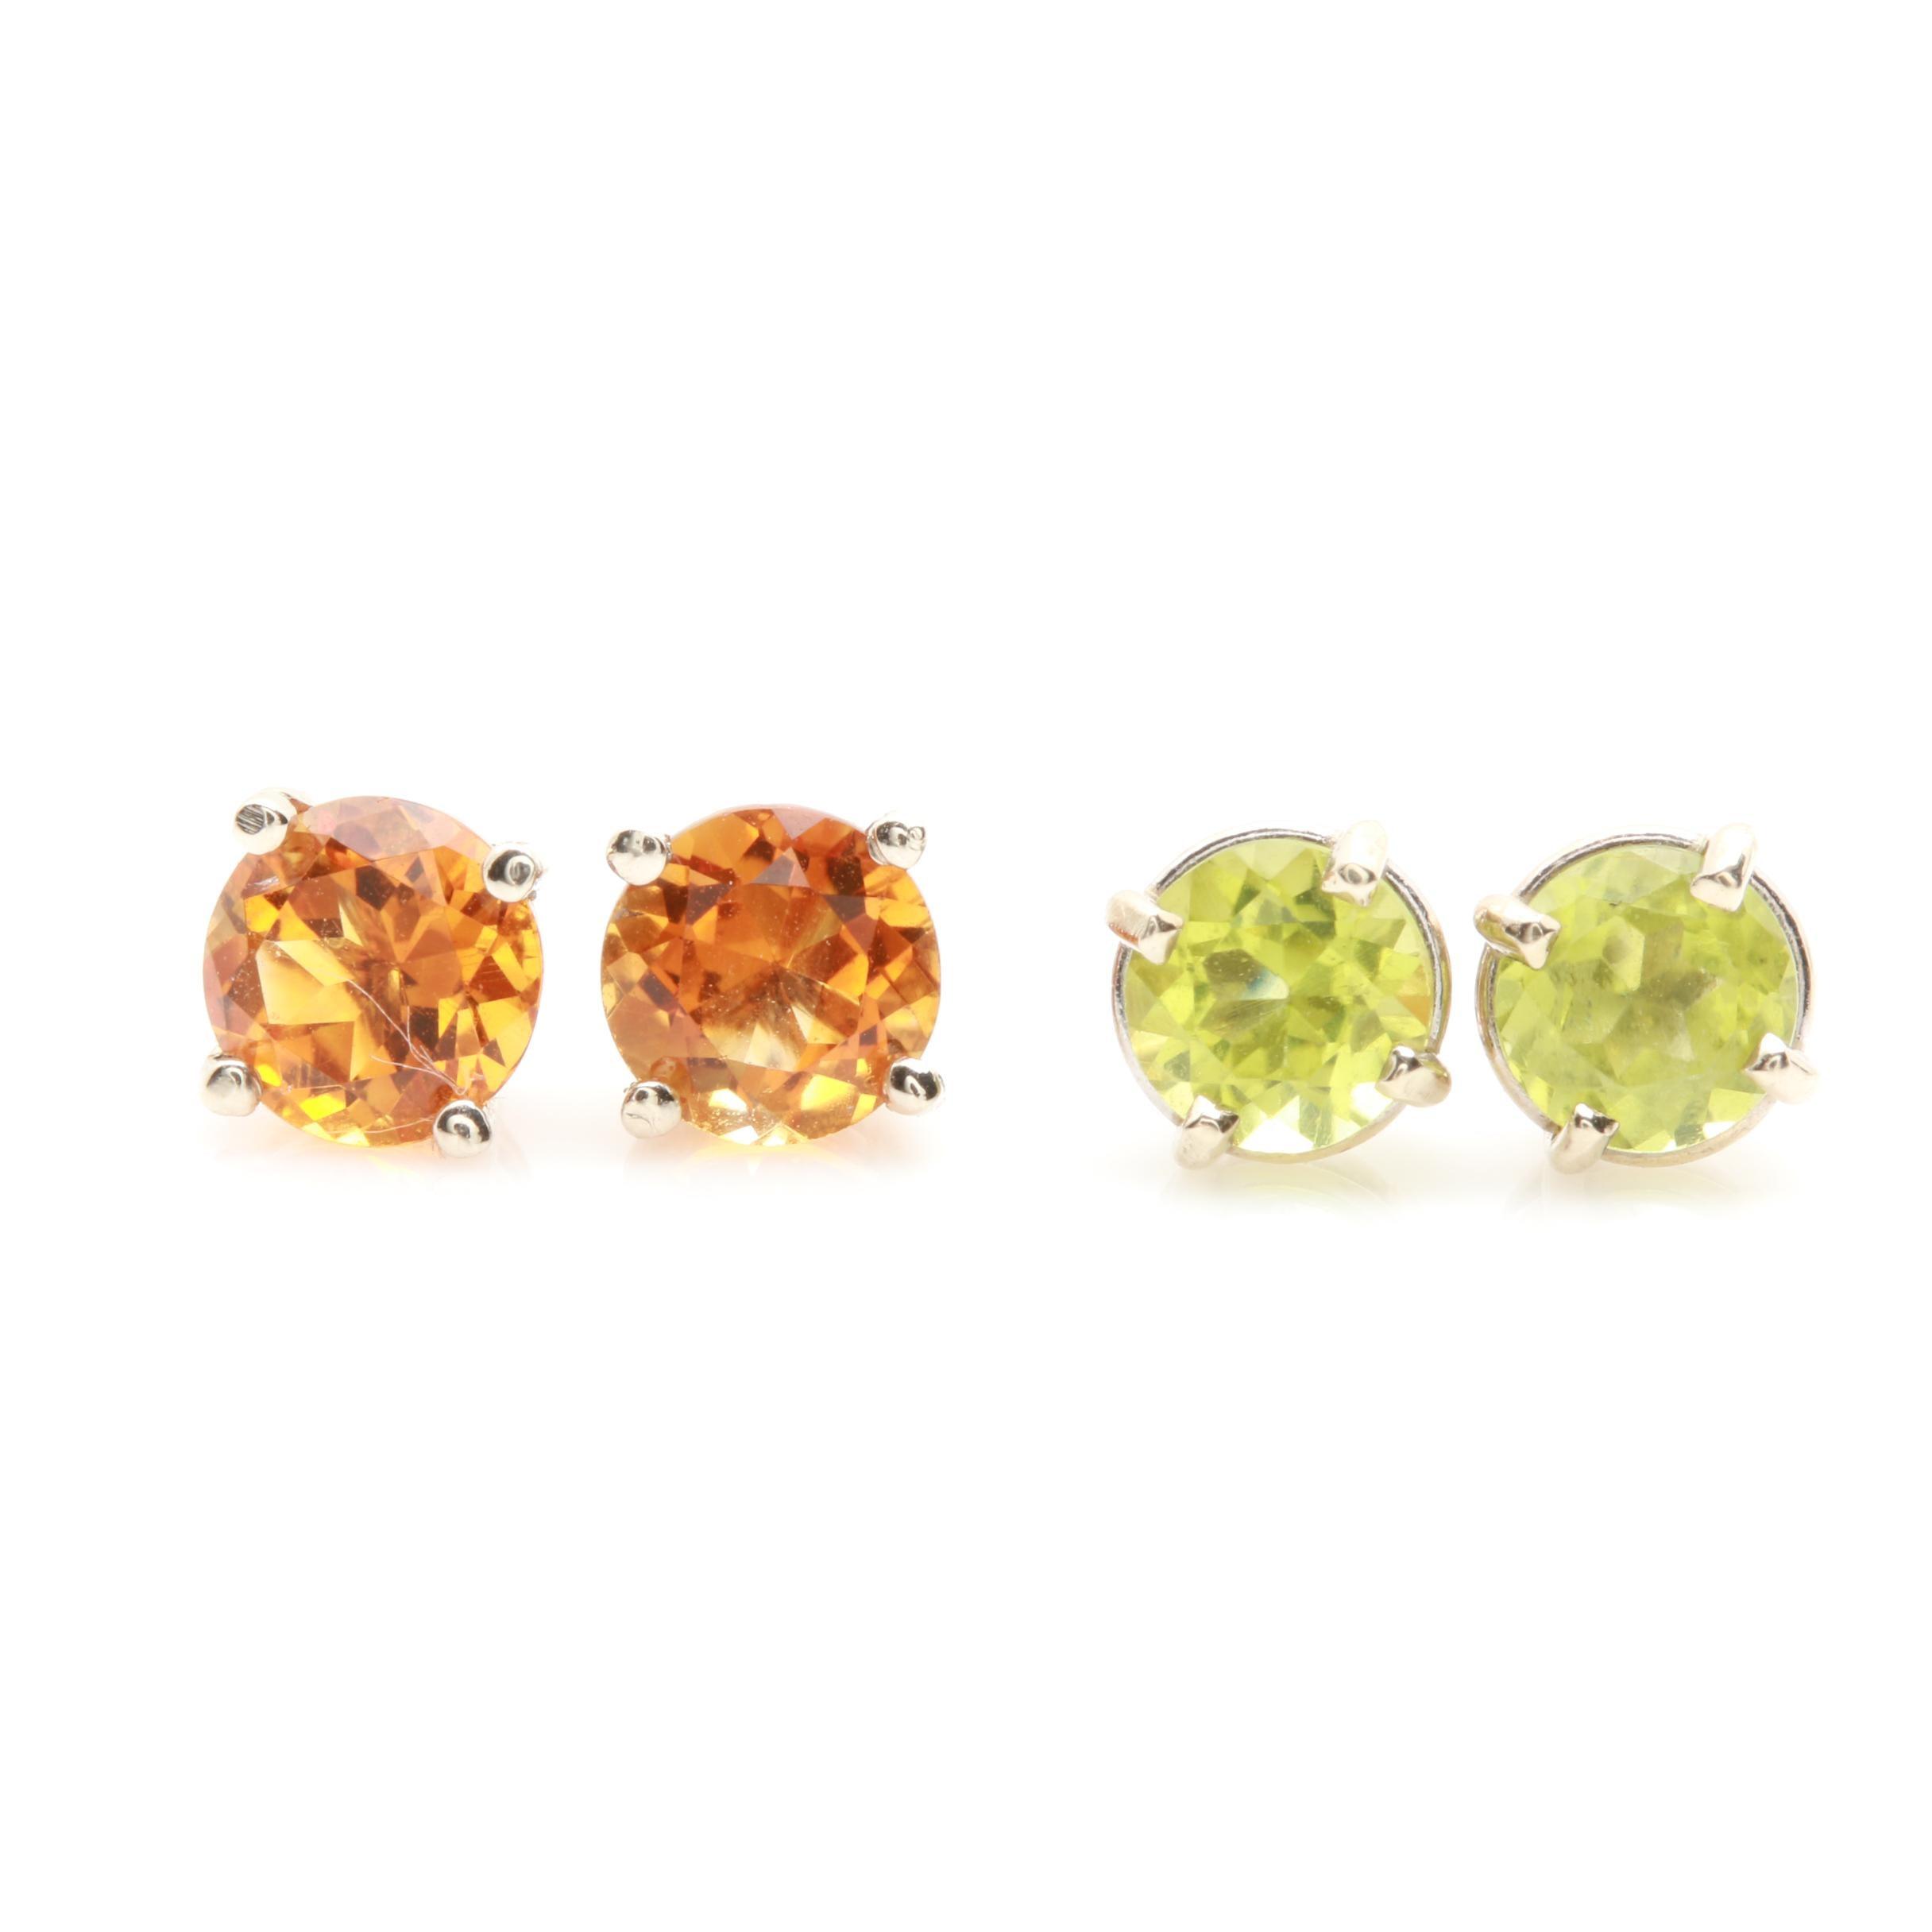 14K Yellow Gold Citrine and Peridot Earrings